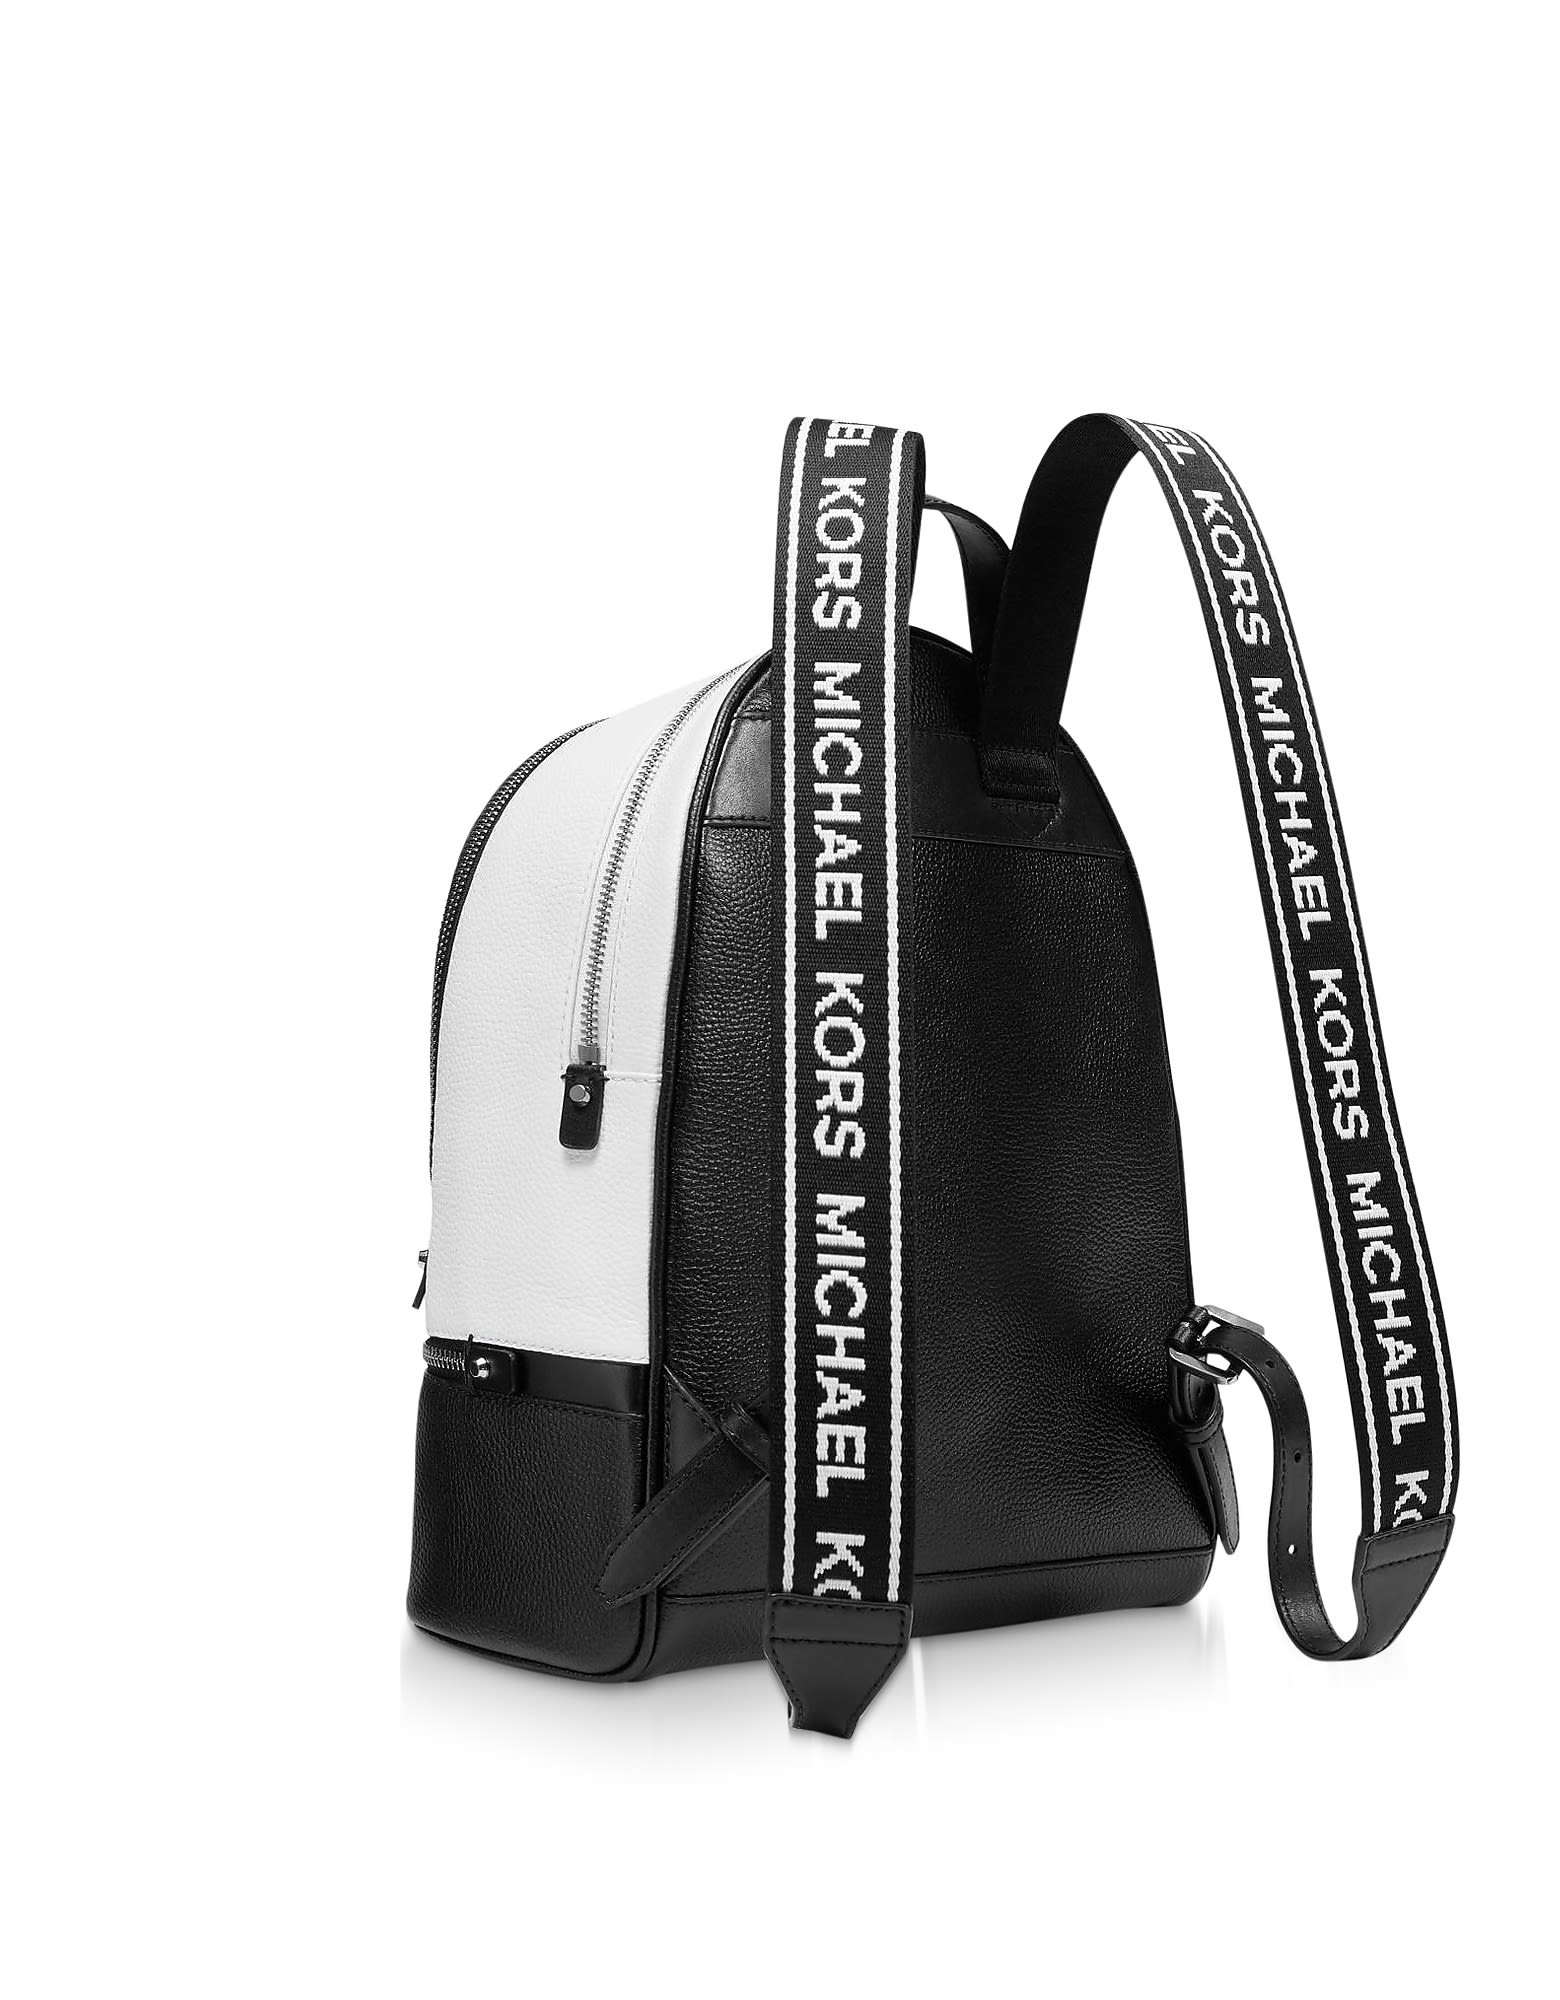 88d525eda33e ... Michael Kors Black And White Rhea Zip Medium Backpack - Black / White  ...